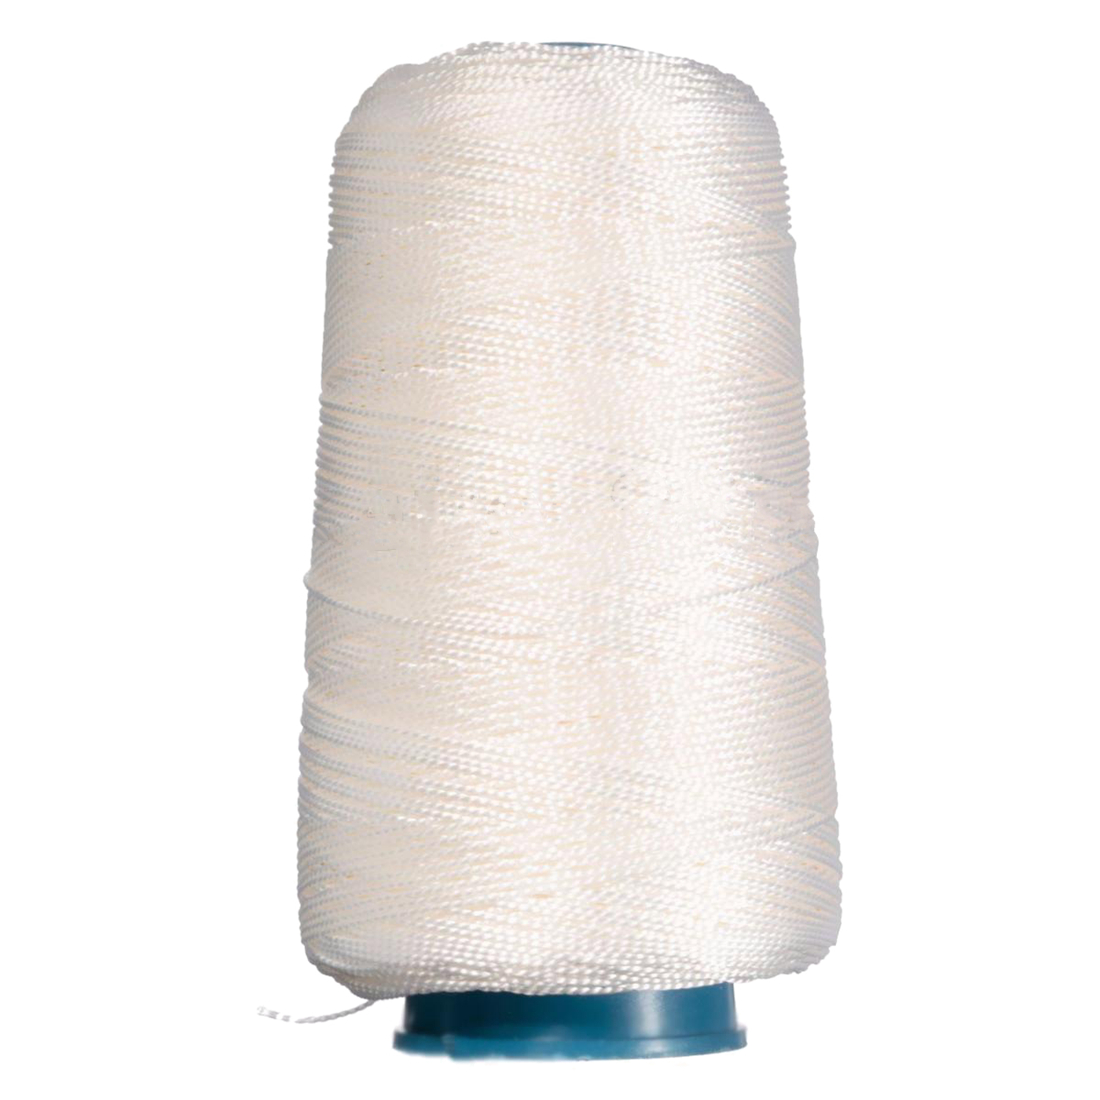 400m 80lbs Nylon Twisted Bowstring Thread Fishing String Sewing Cord Kite Line, White maquina de coser de mano